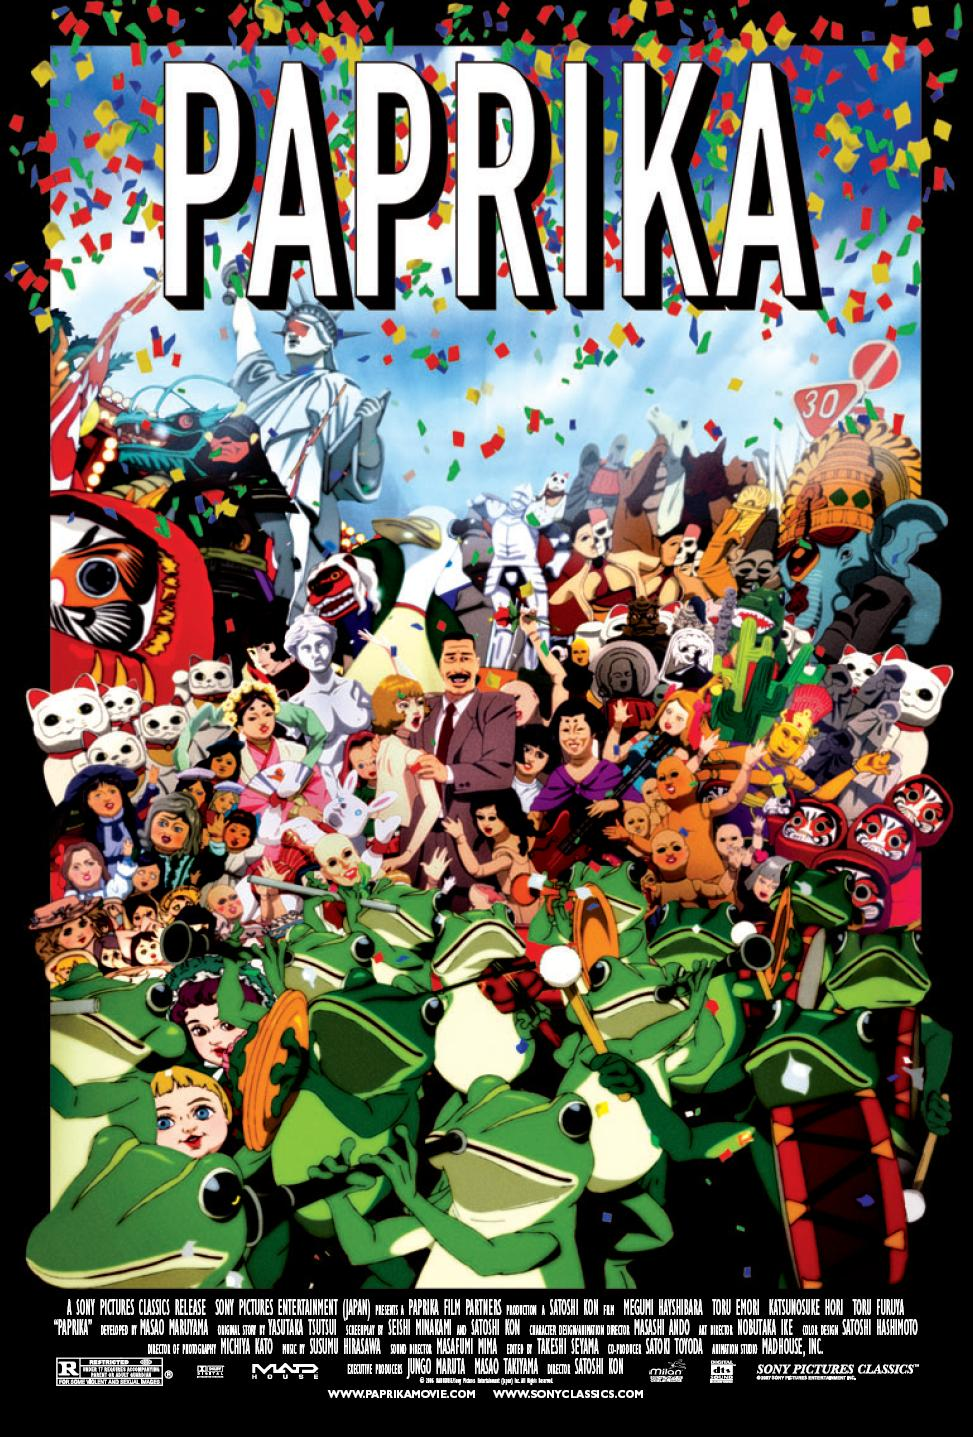 http://dorkshelf.com/wordpress/wp-content/uploads/2011/02/paprika-poster.jpg